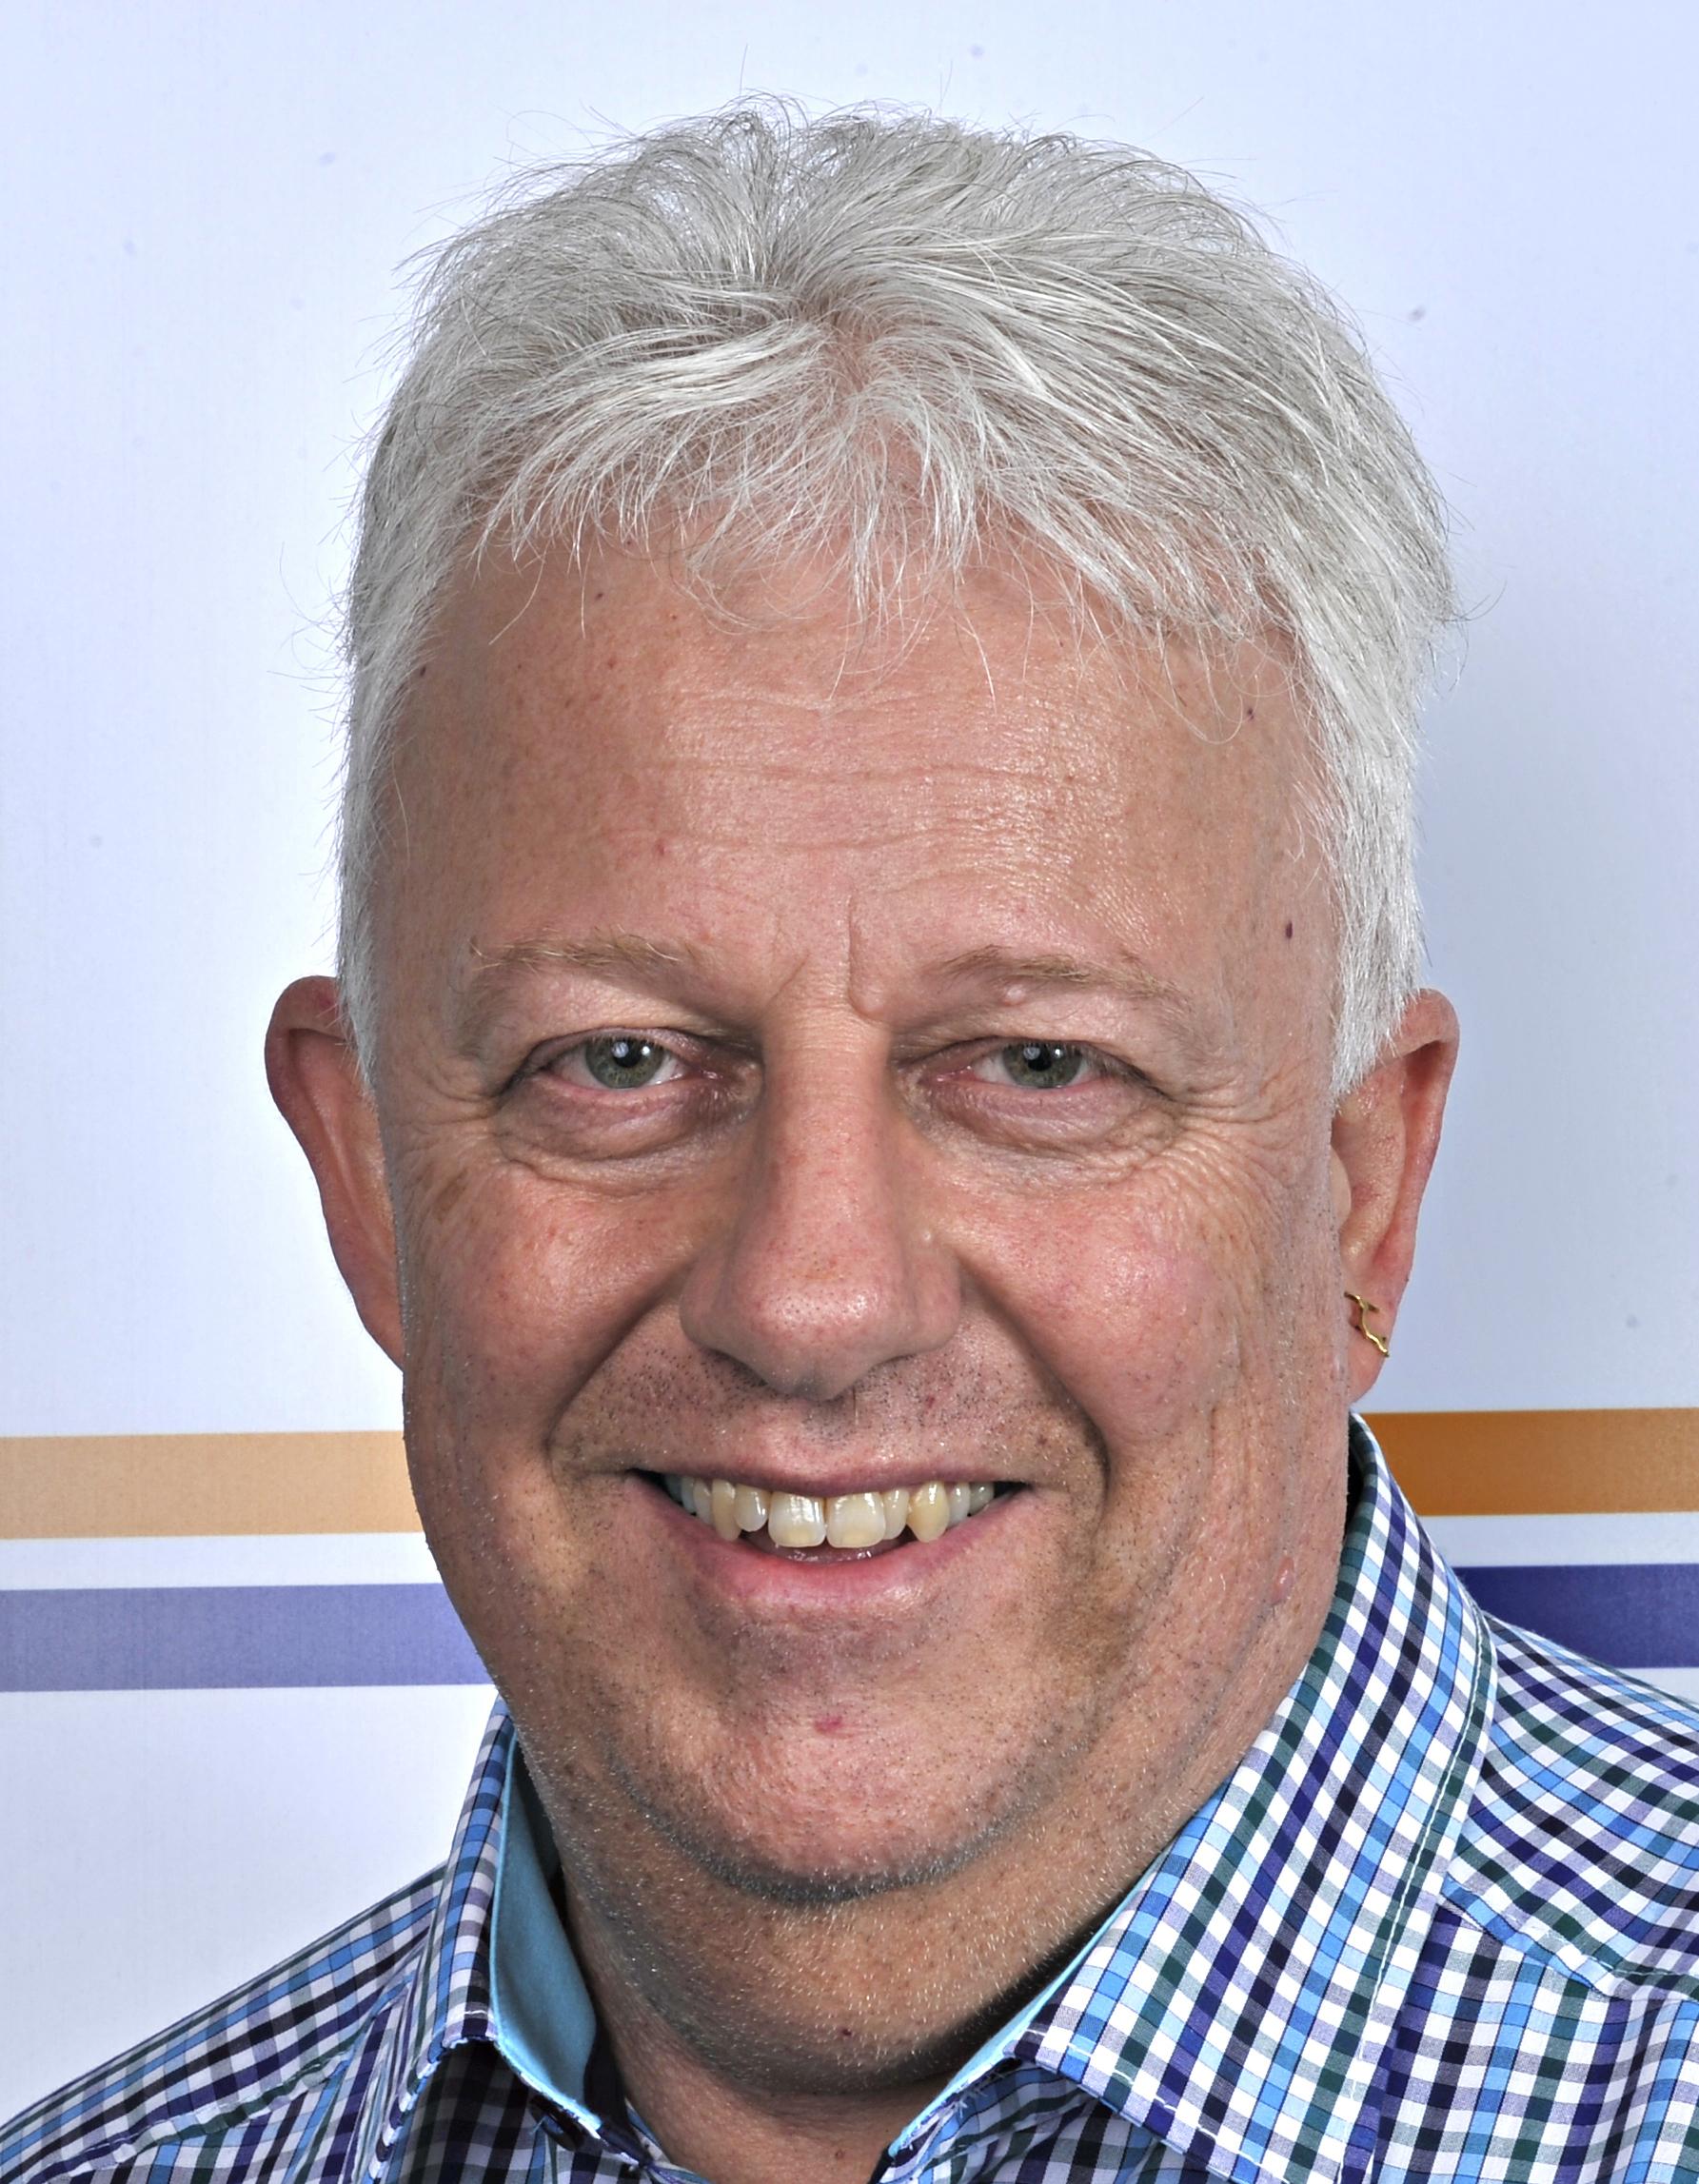 lic. phil. Heinz Rohner